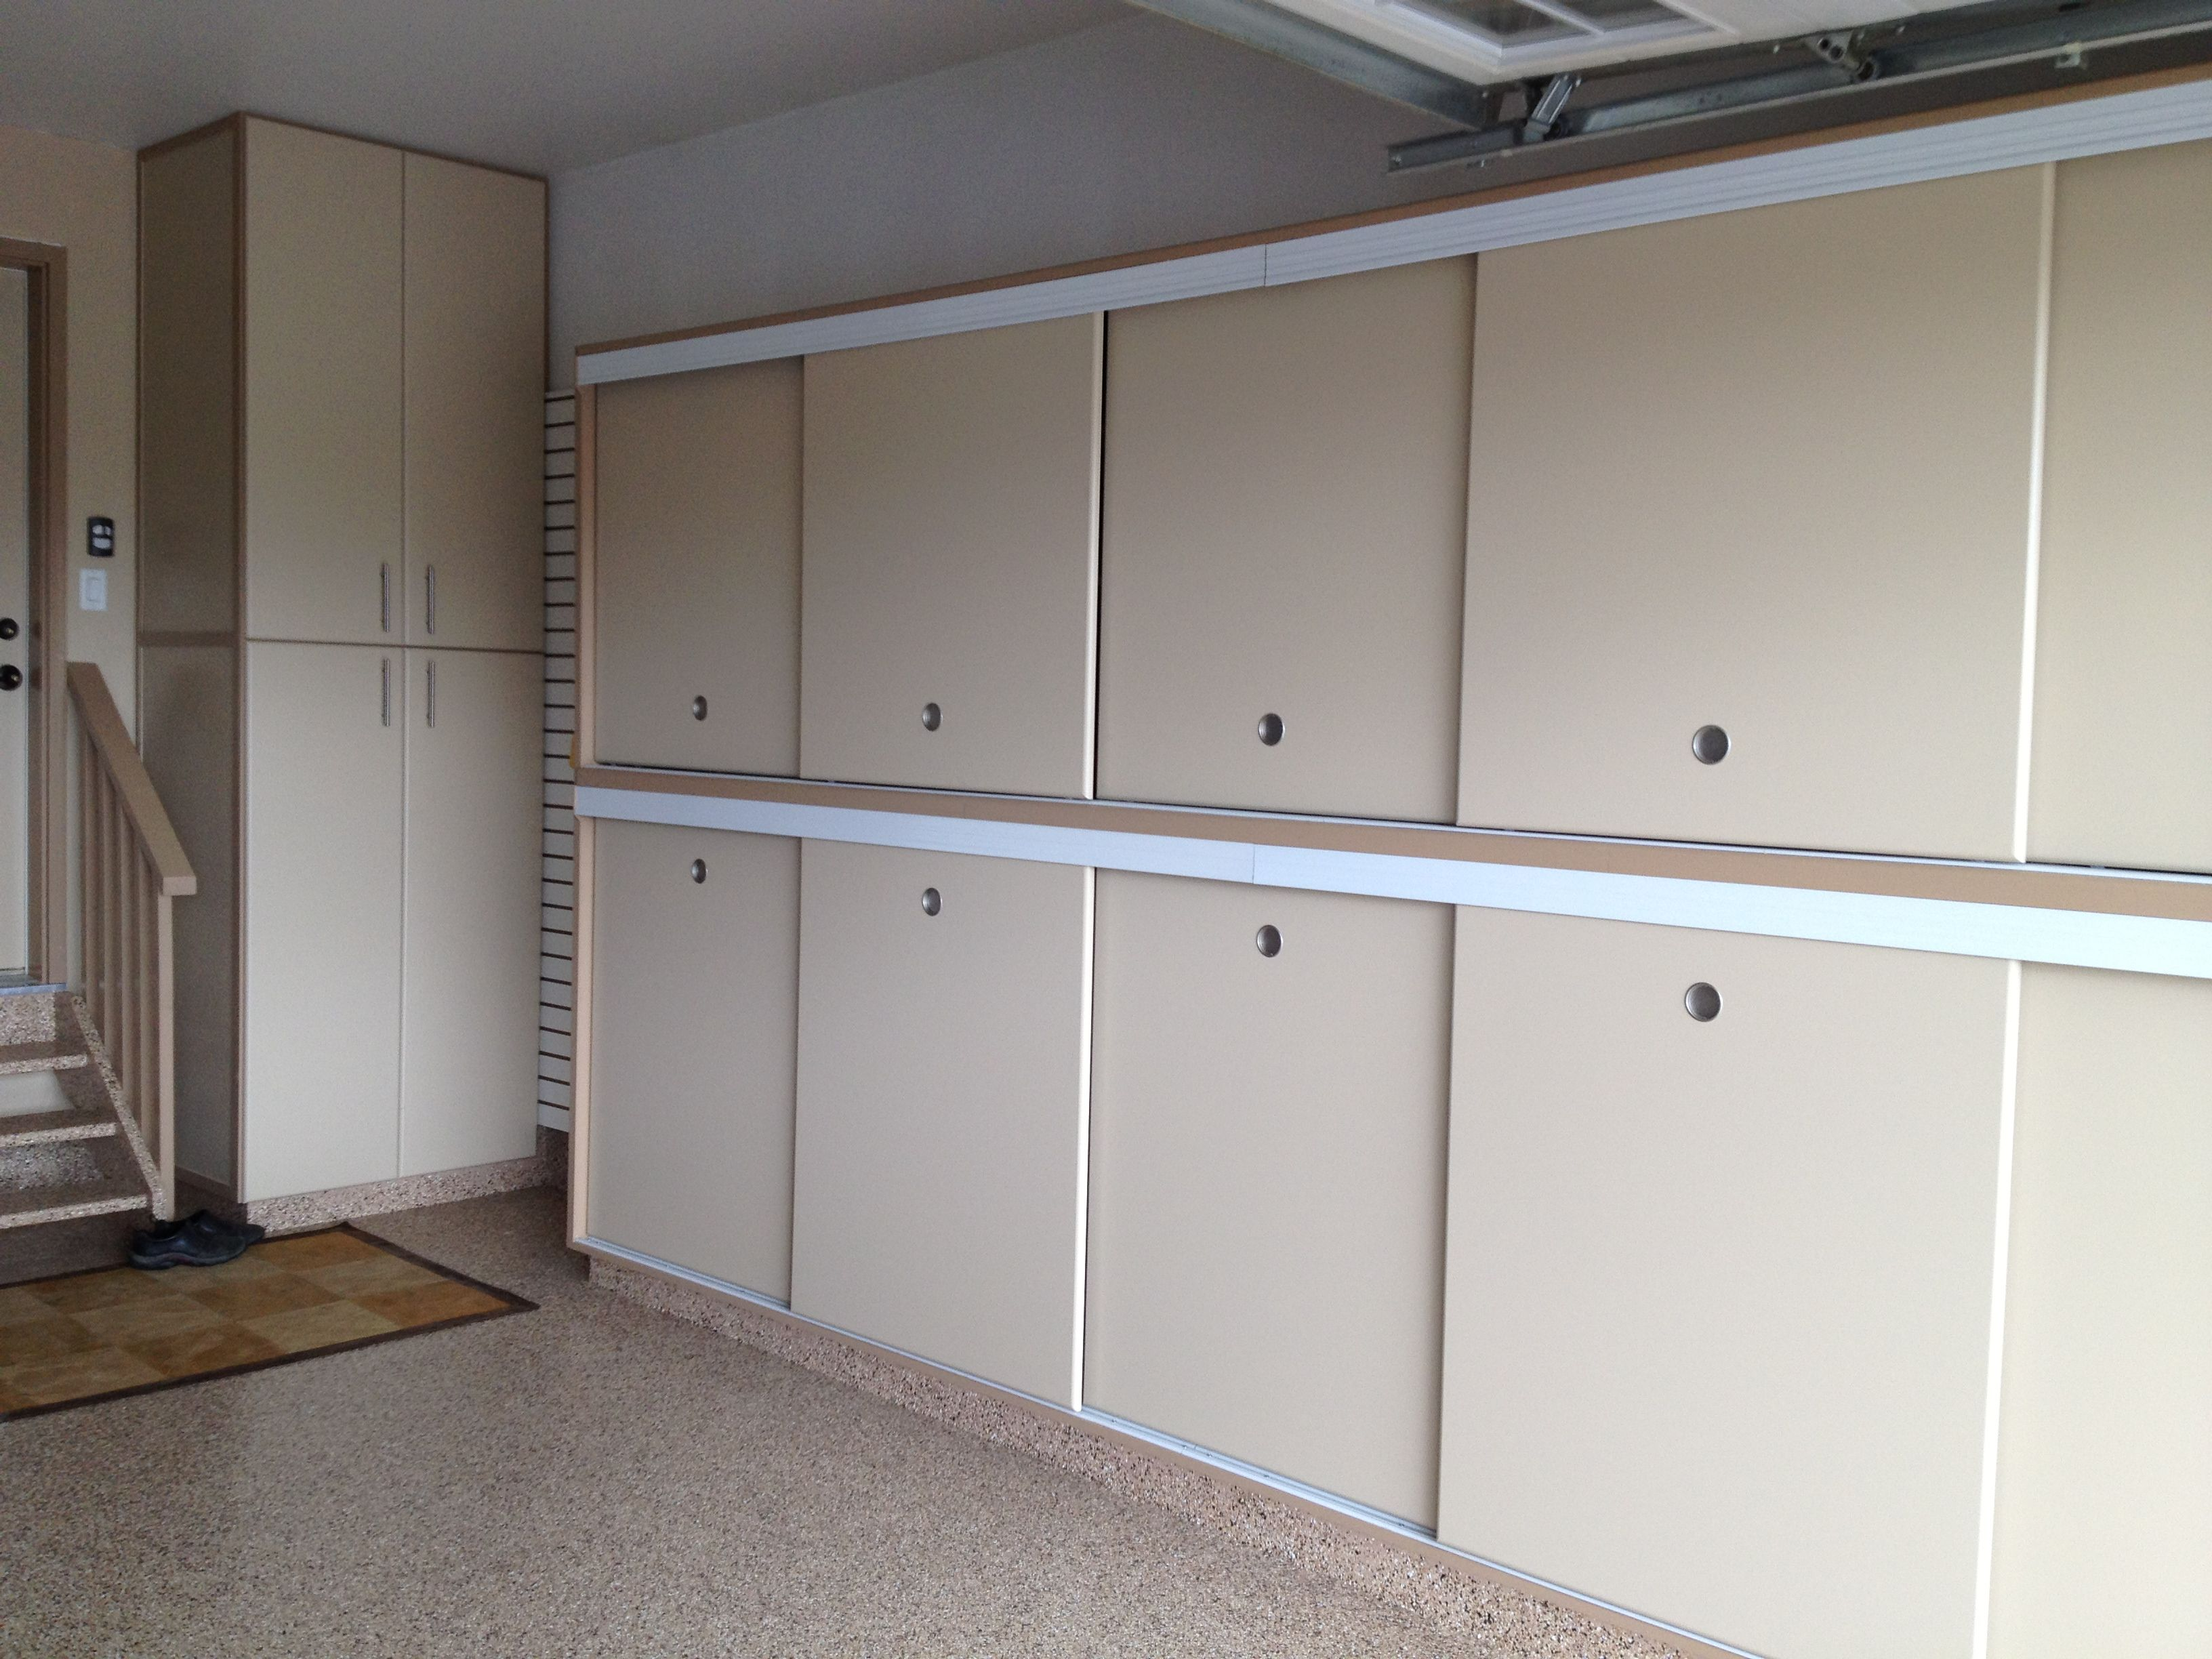 Slotwall, Epoxy Floor, Custom Cabinets, Sliding Doors ...